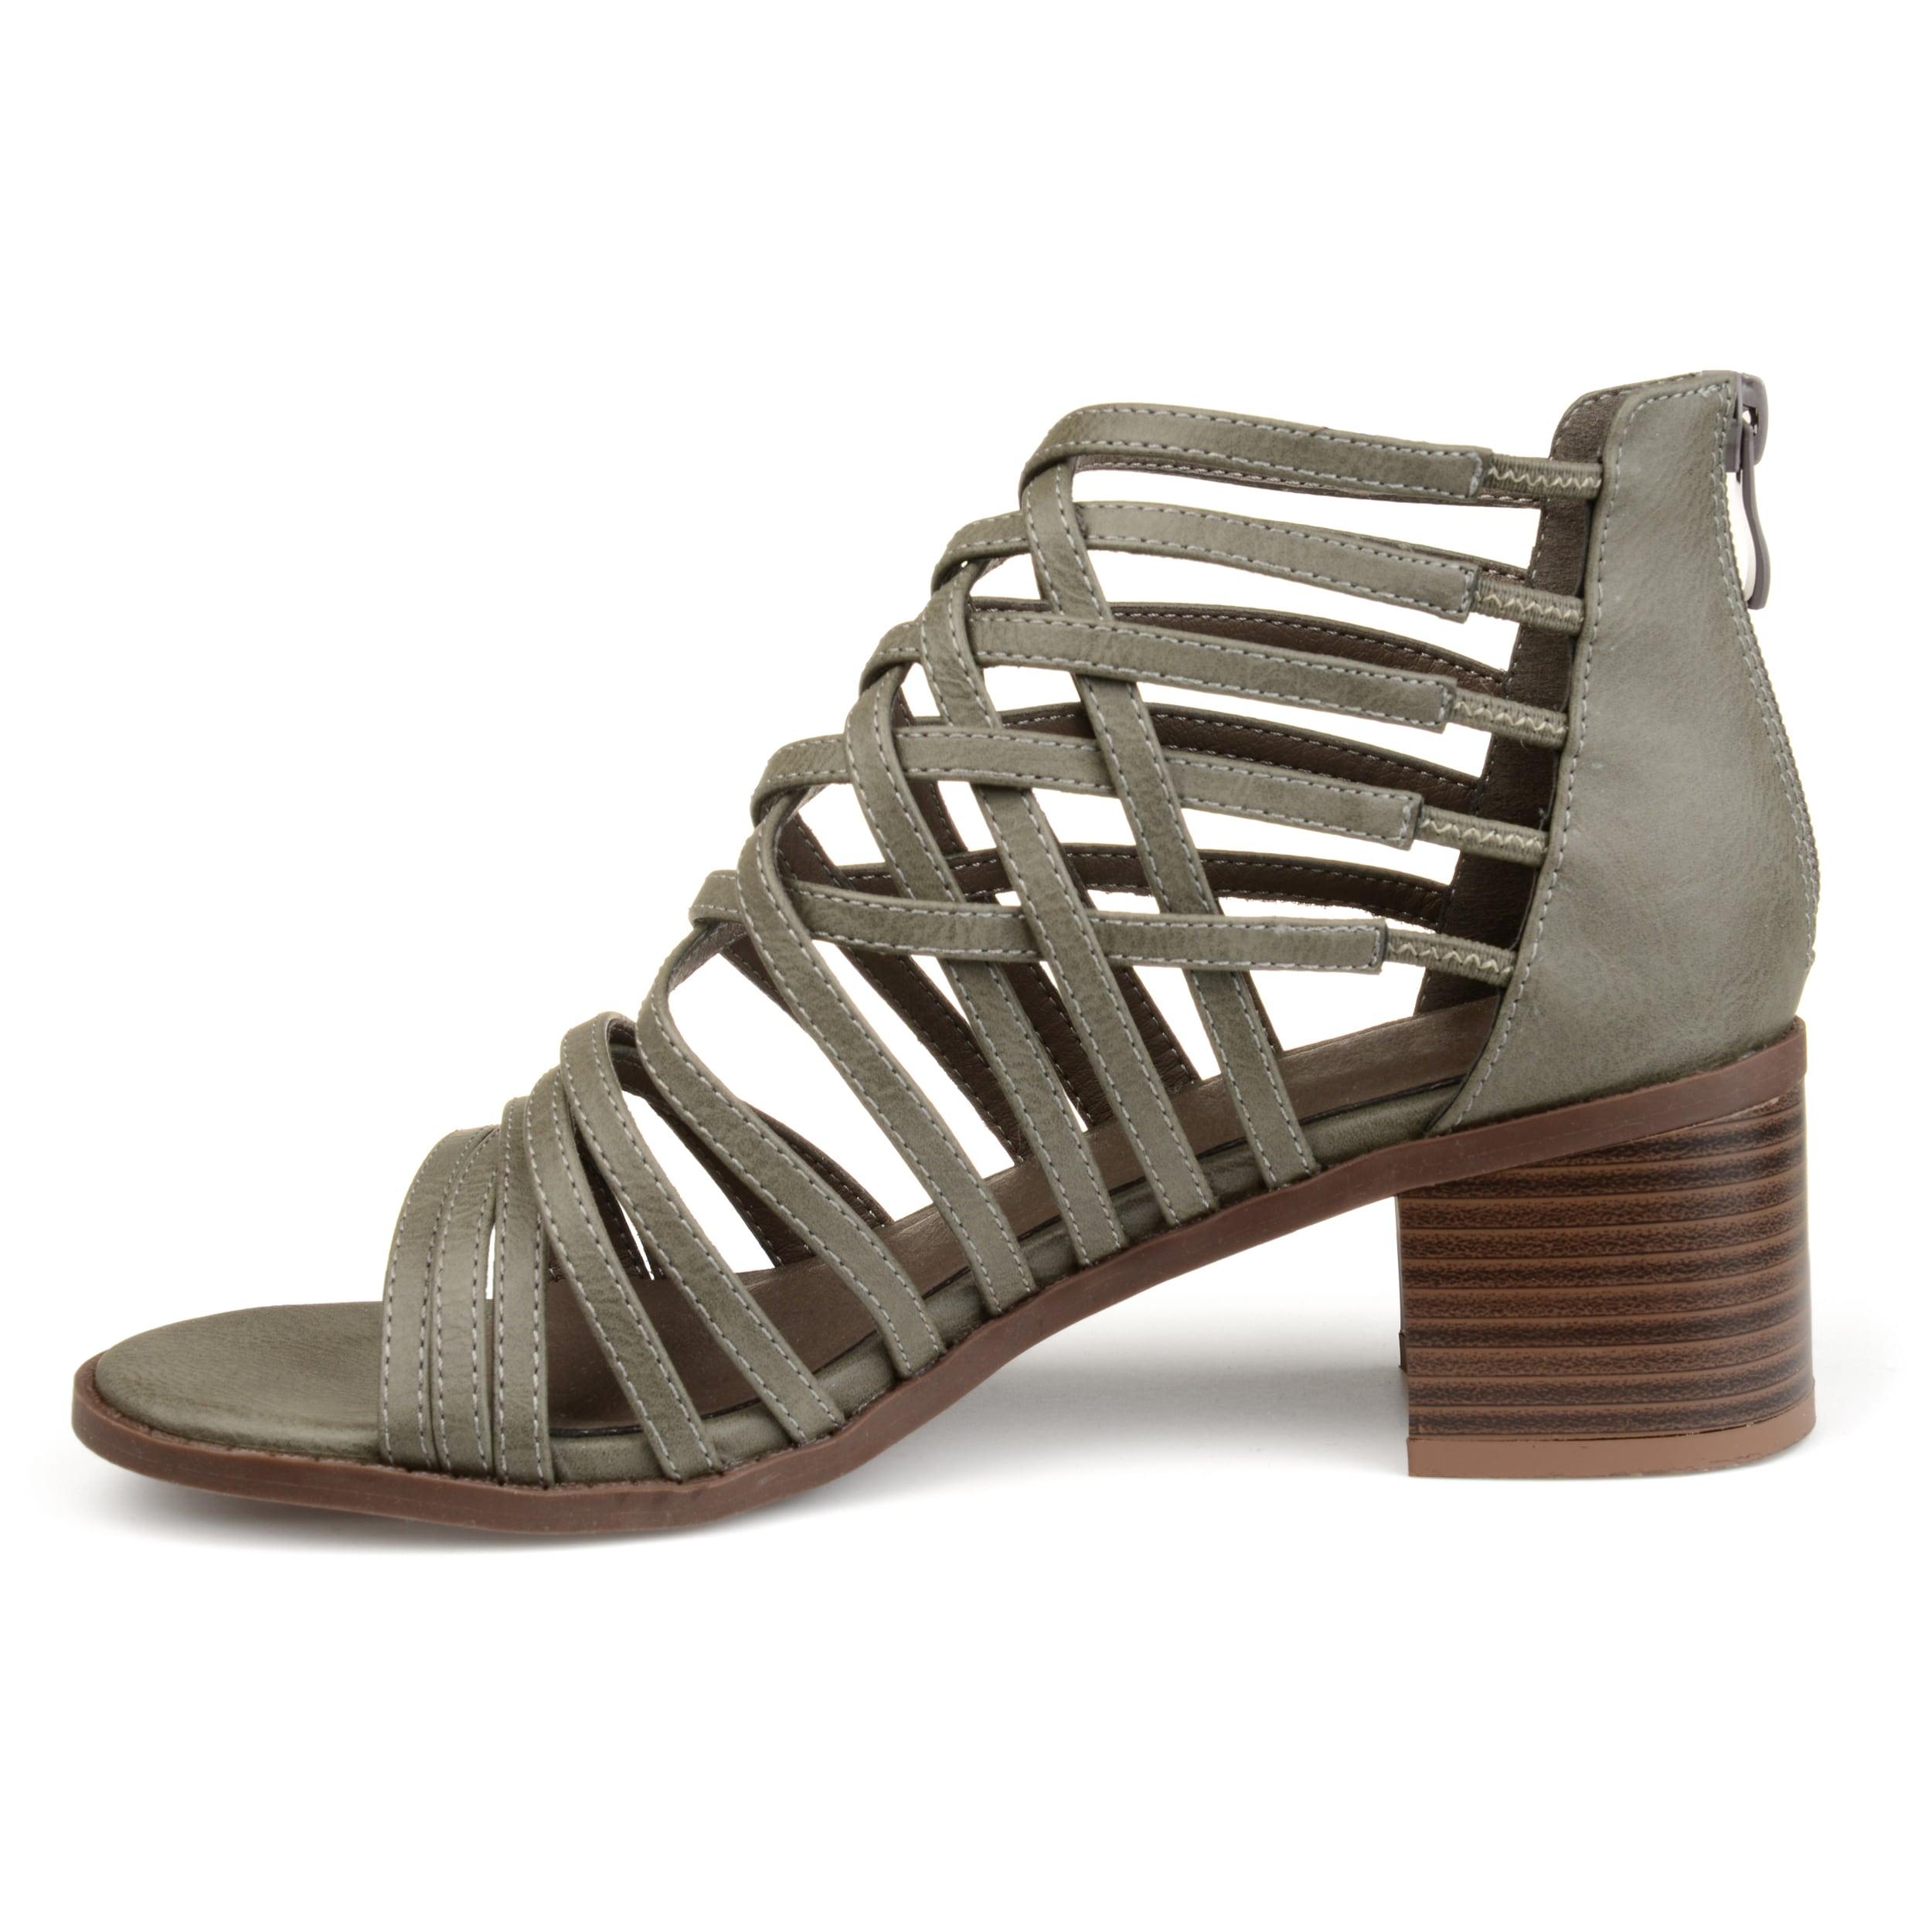 Journee Collection Diya ... Women's High Heel Sandals buy cheap shopping online discount huge surprise footlocker sale online outlet genuine Sgt2cU